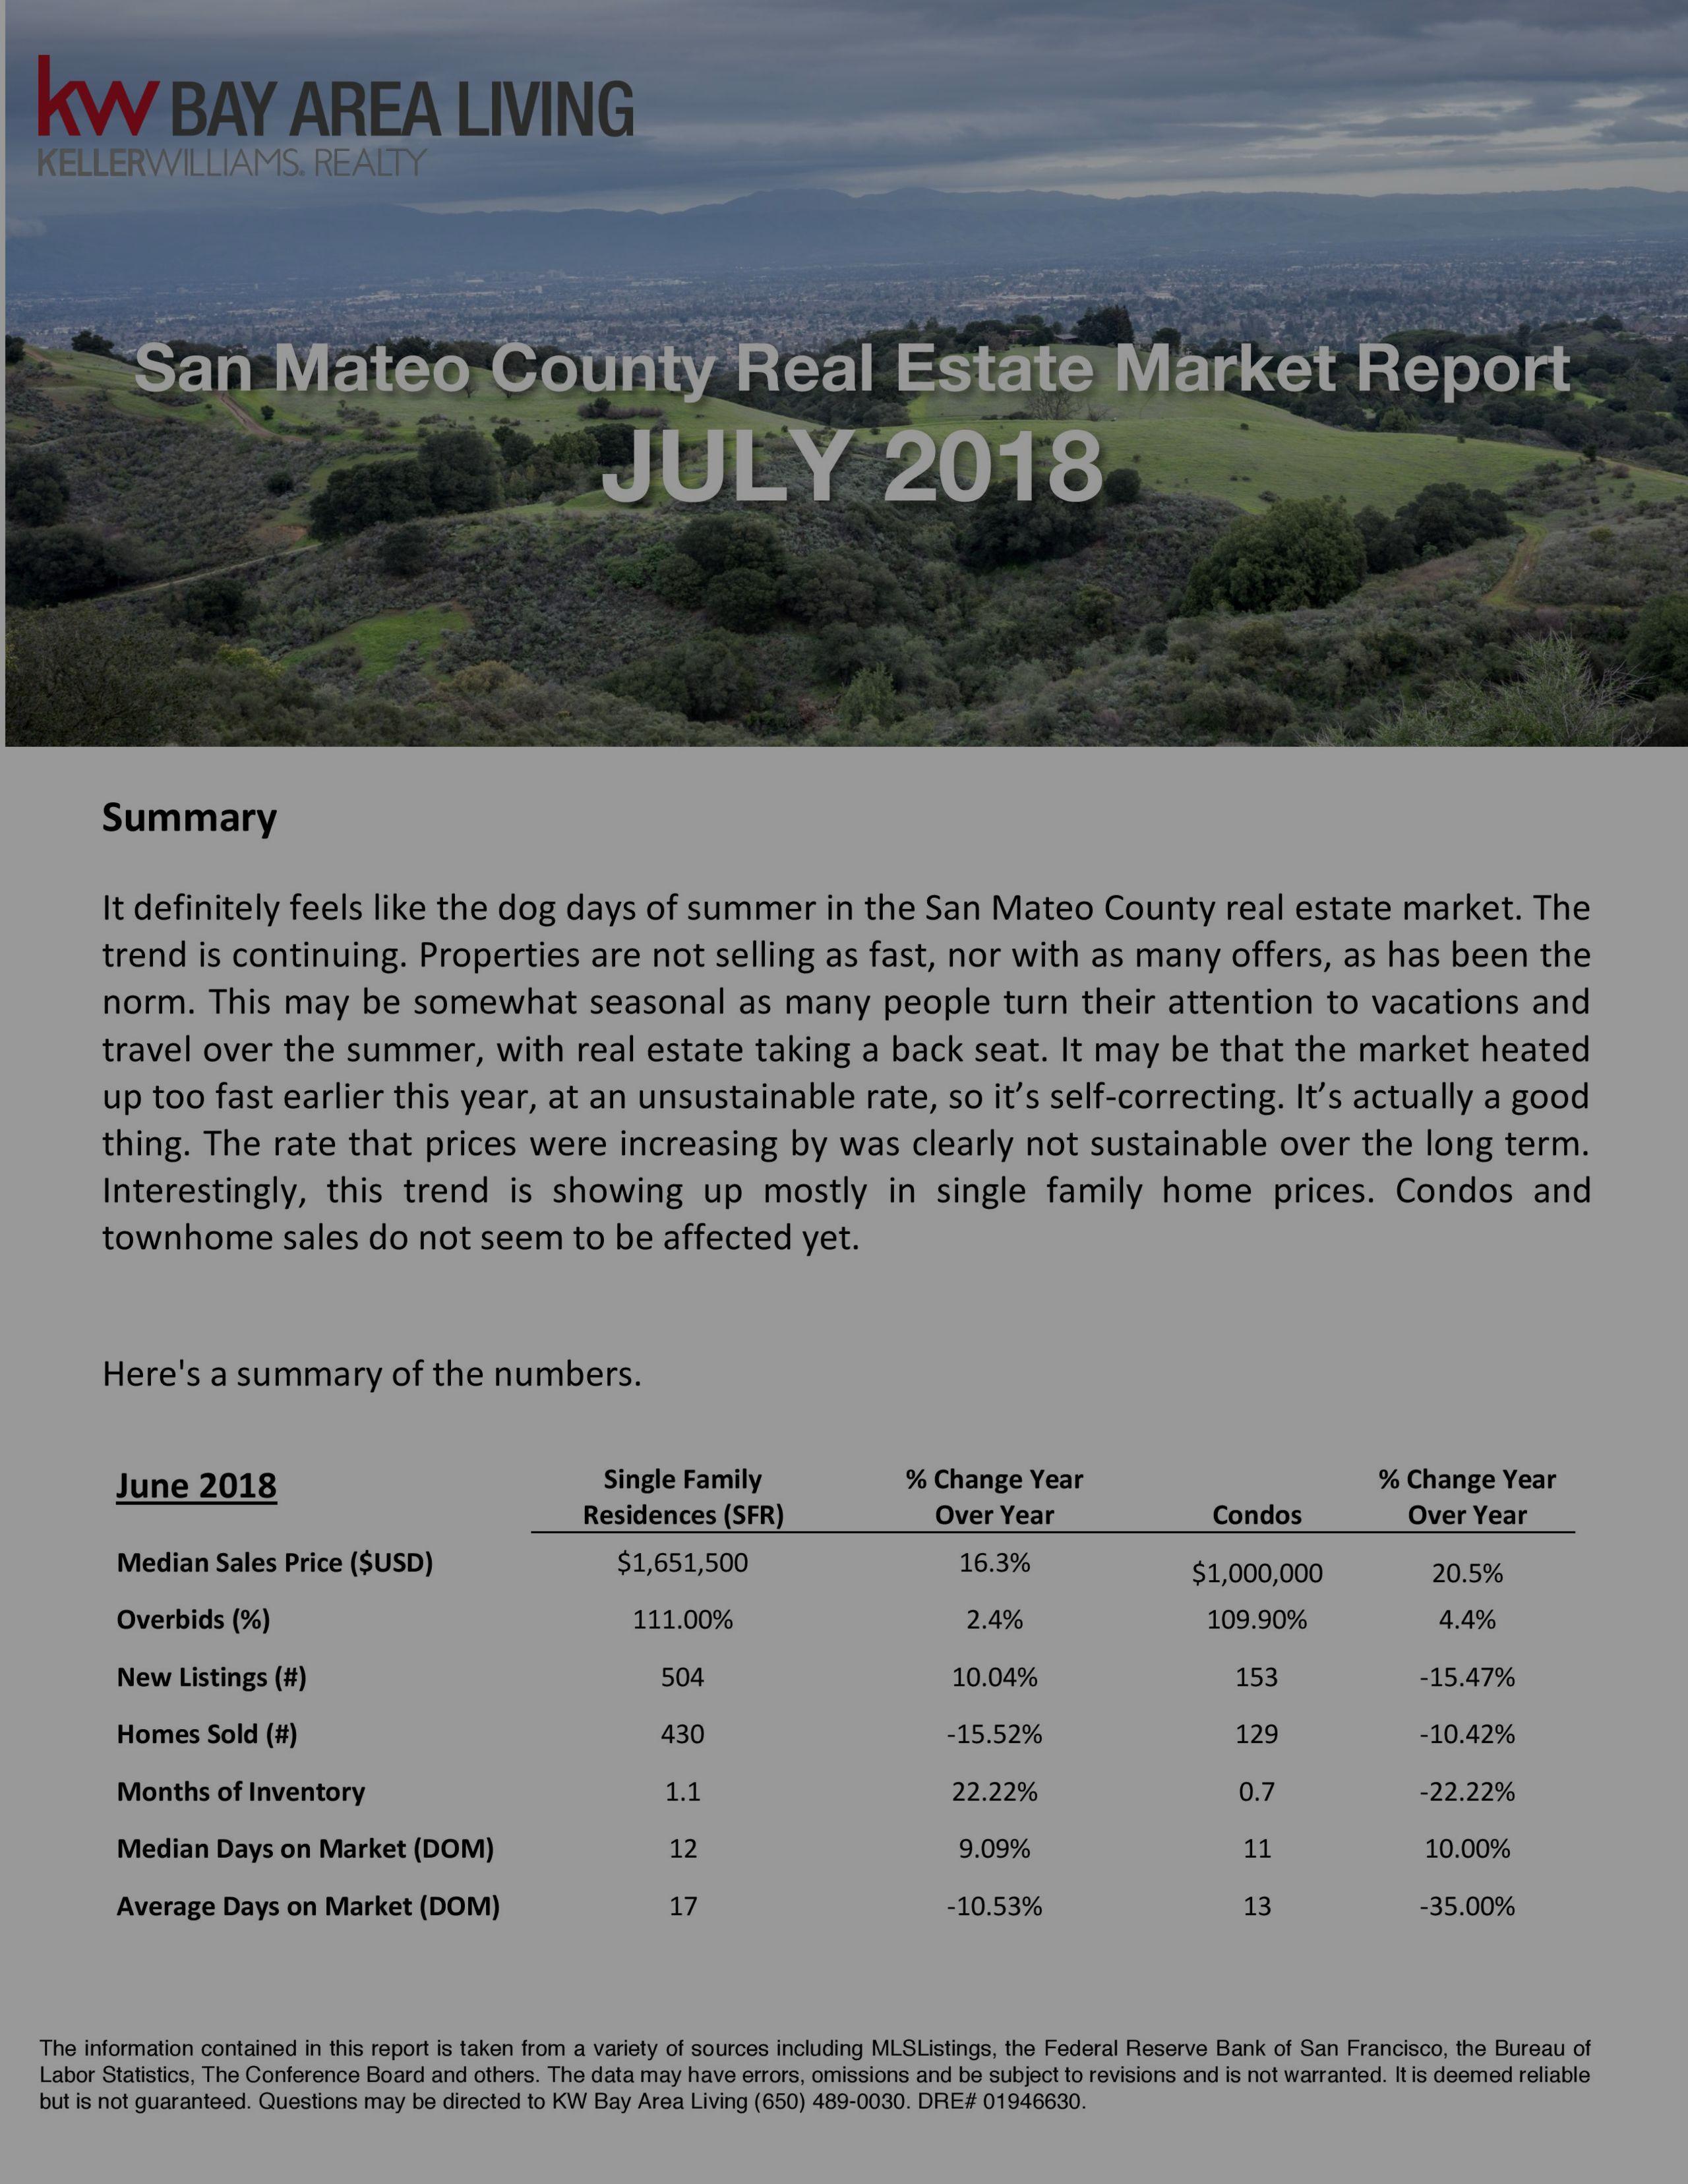 July 2018 Market Report